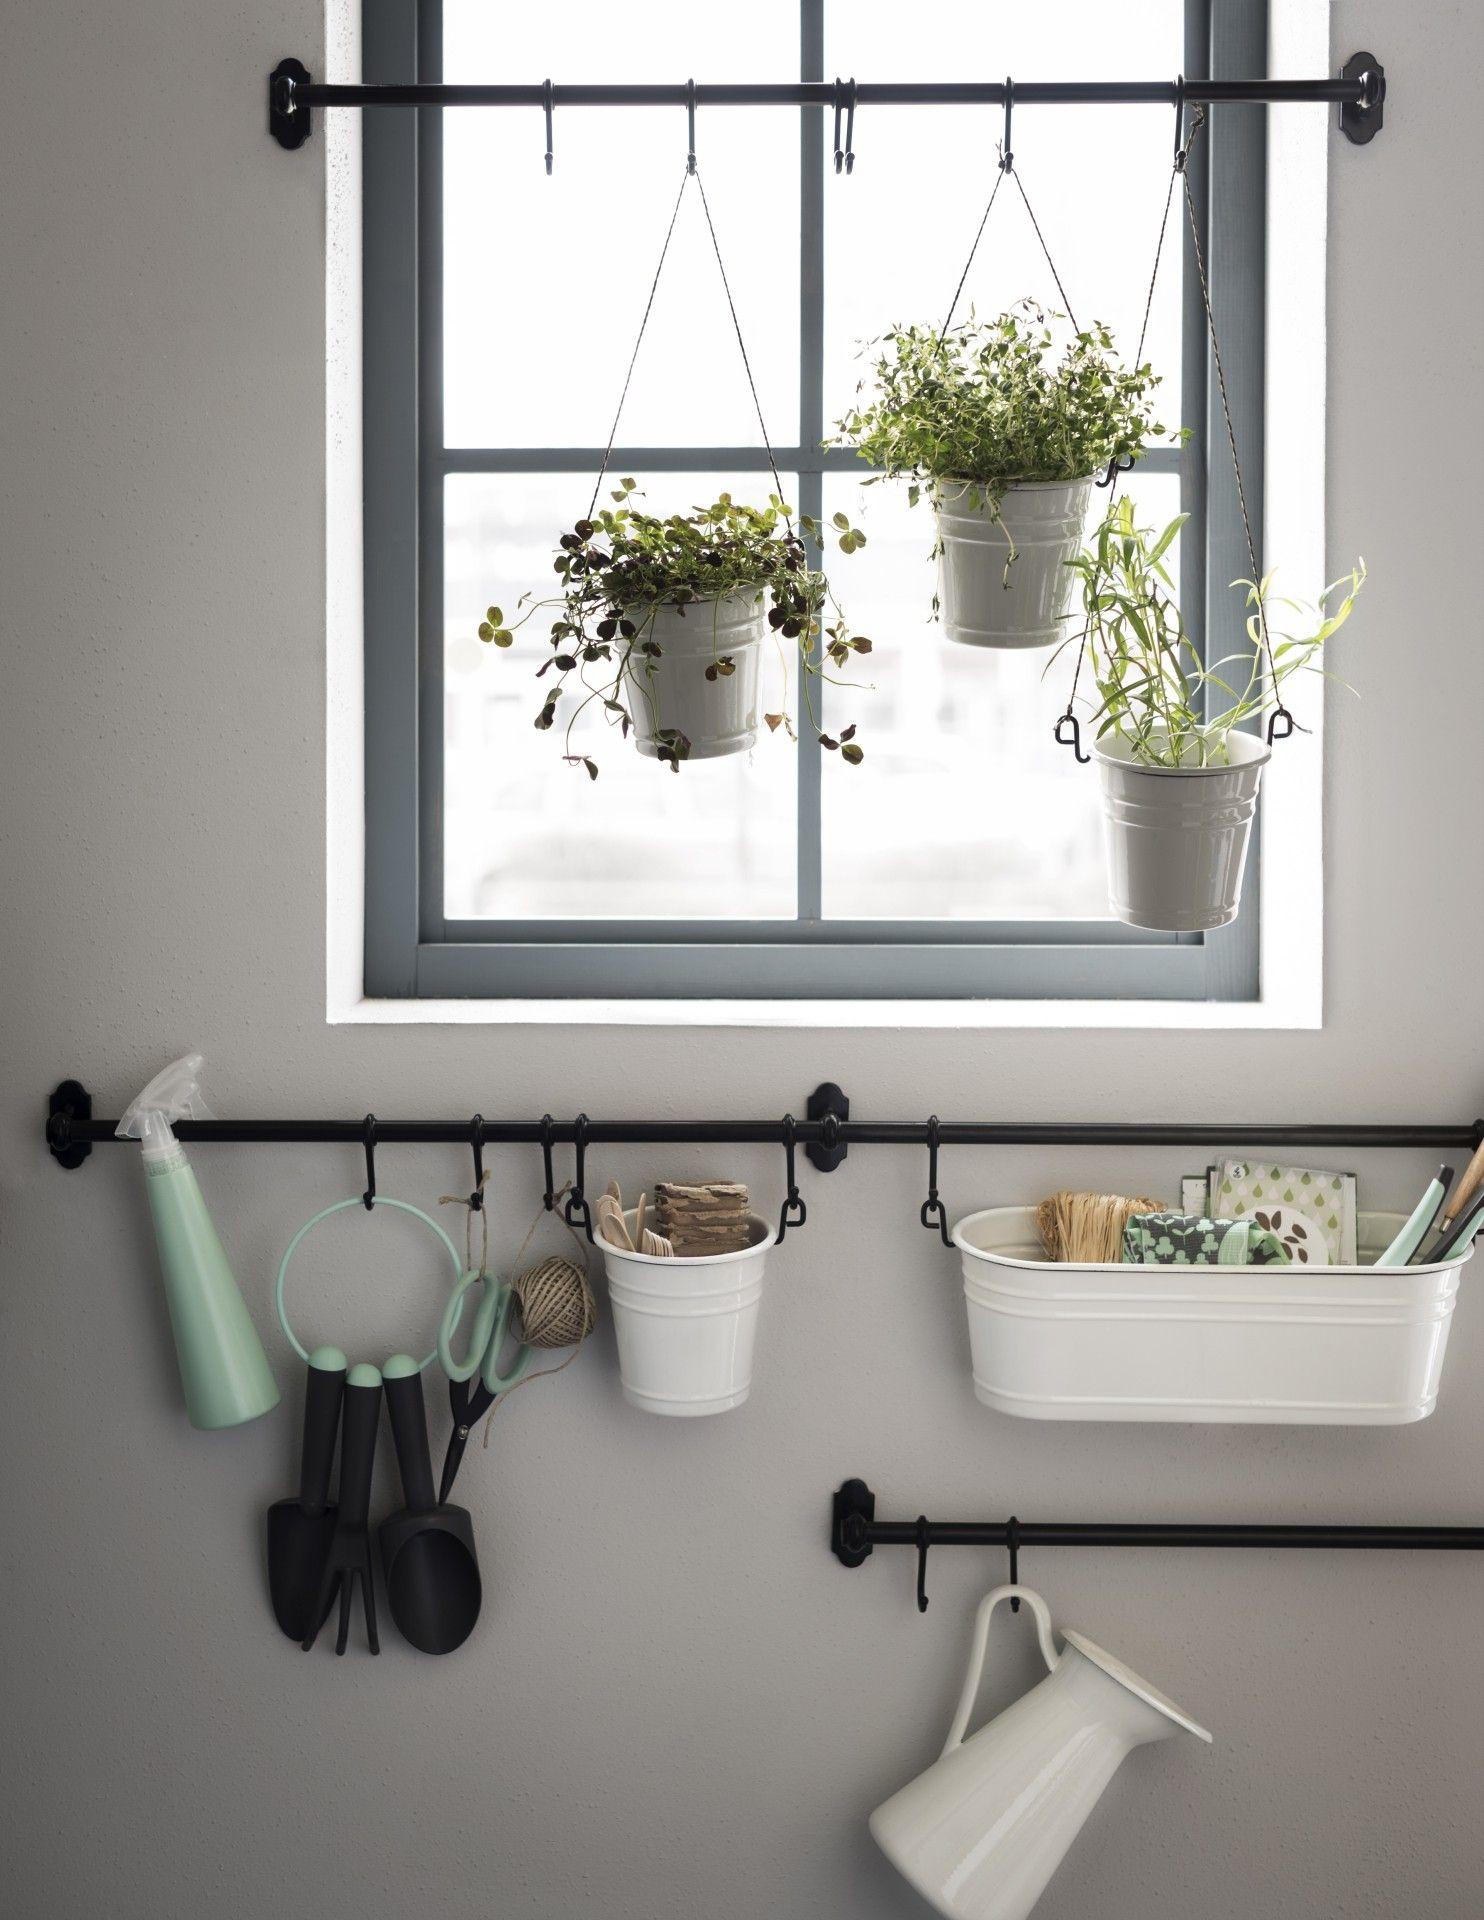 black iron hanging rods, black iron hooks, white box and storage